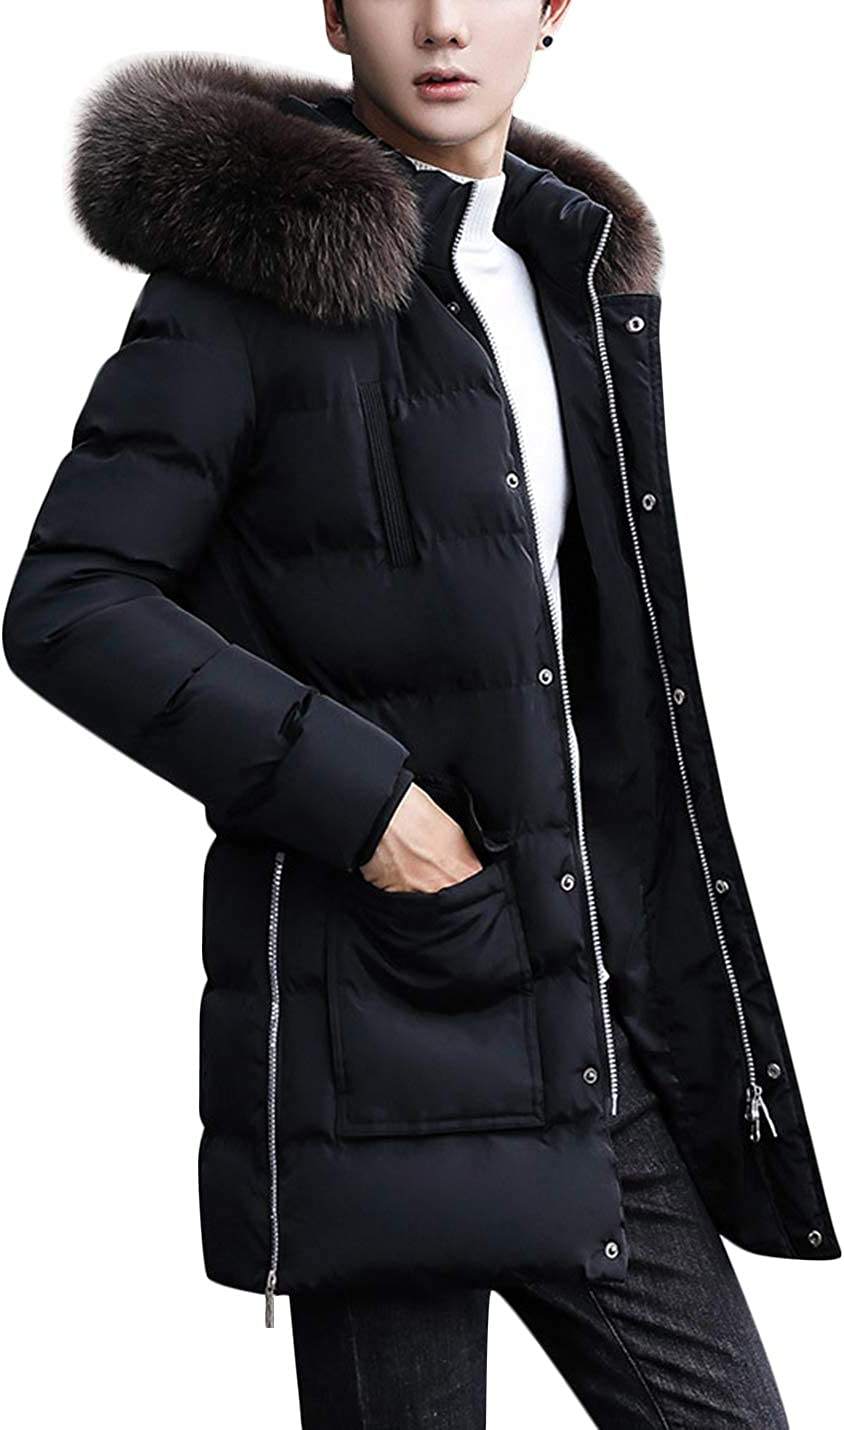 Springrain Men's Winter Fur Hood Quilted Padding Jacket Windbreaker Puffer Coat